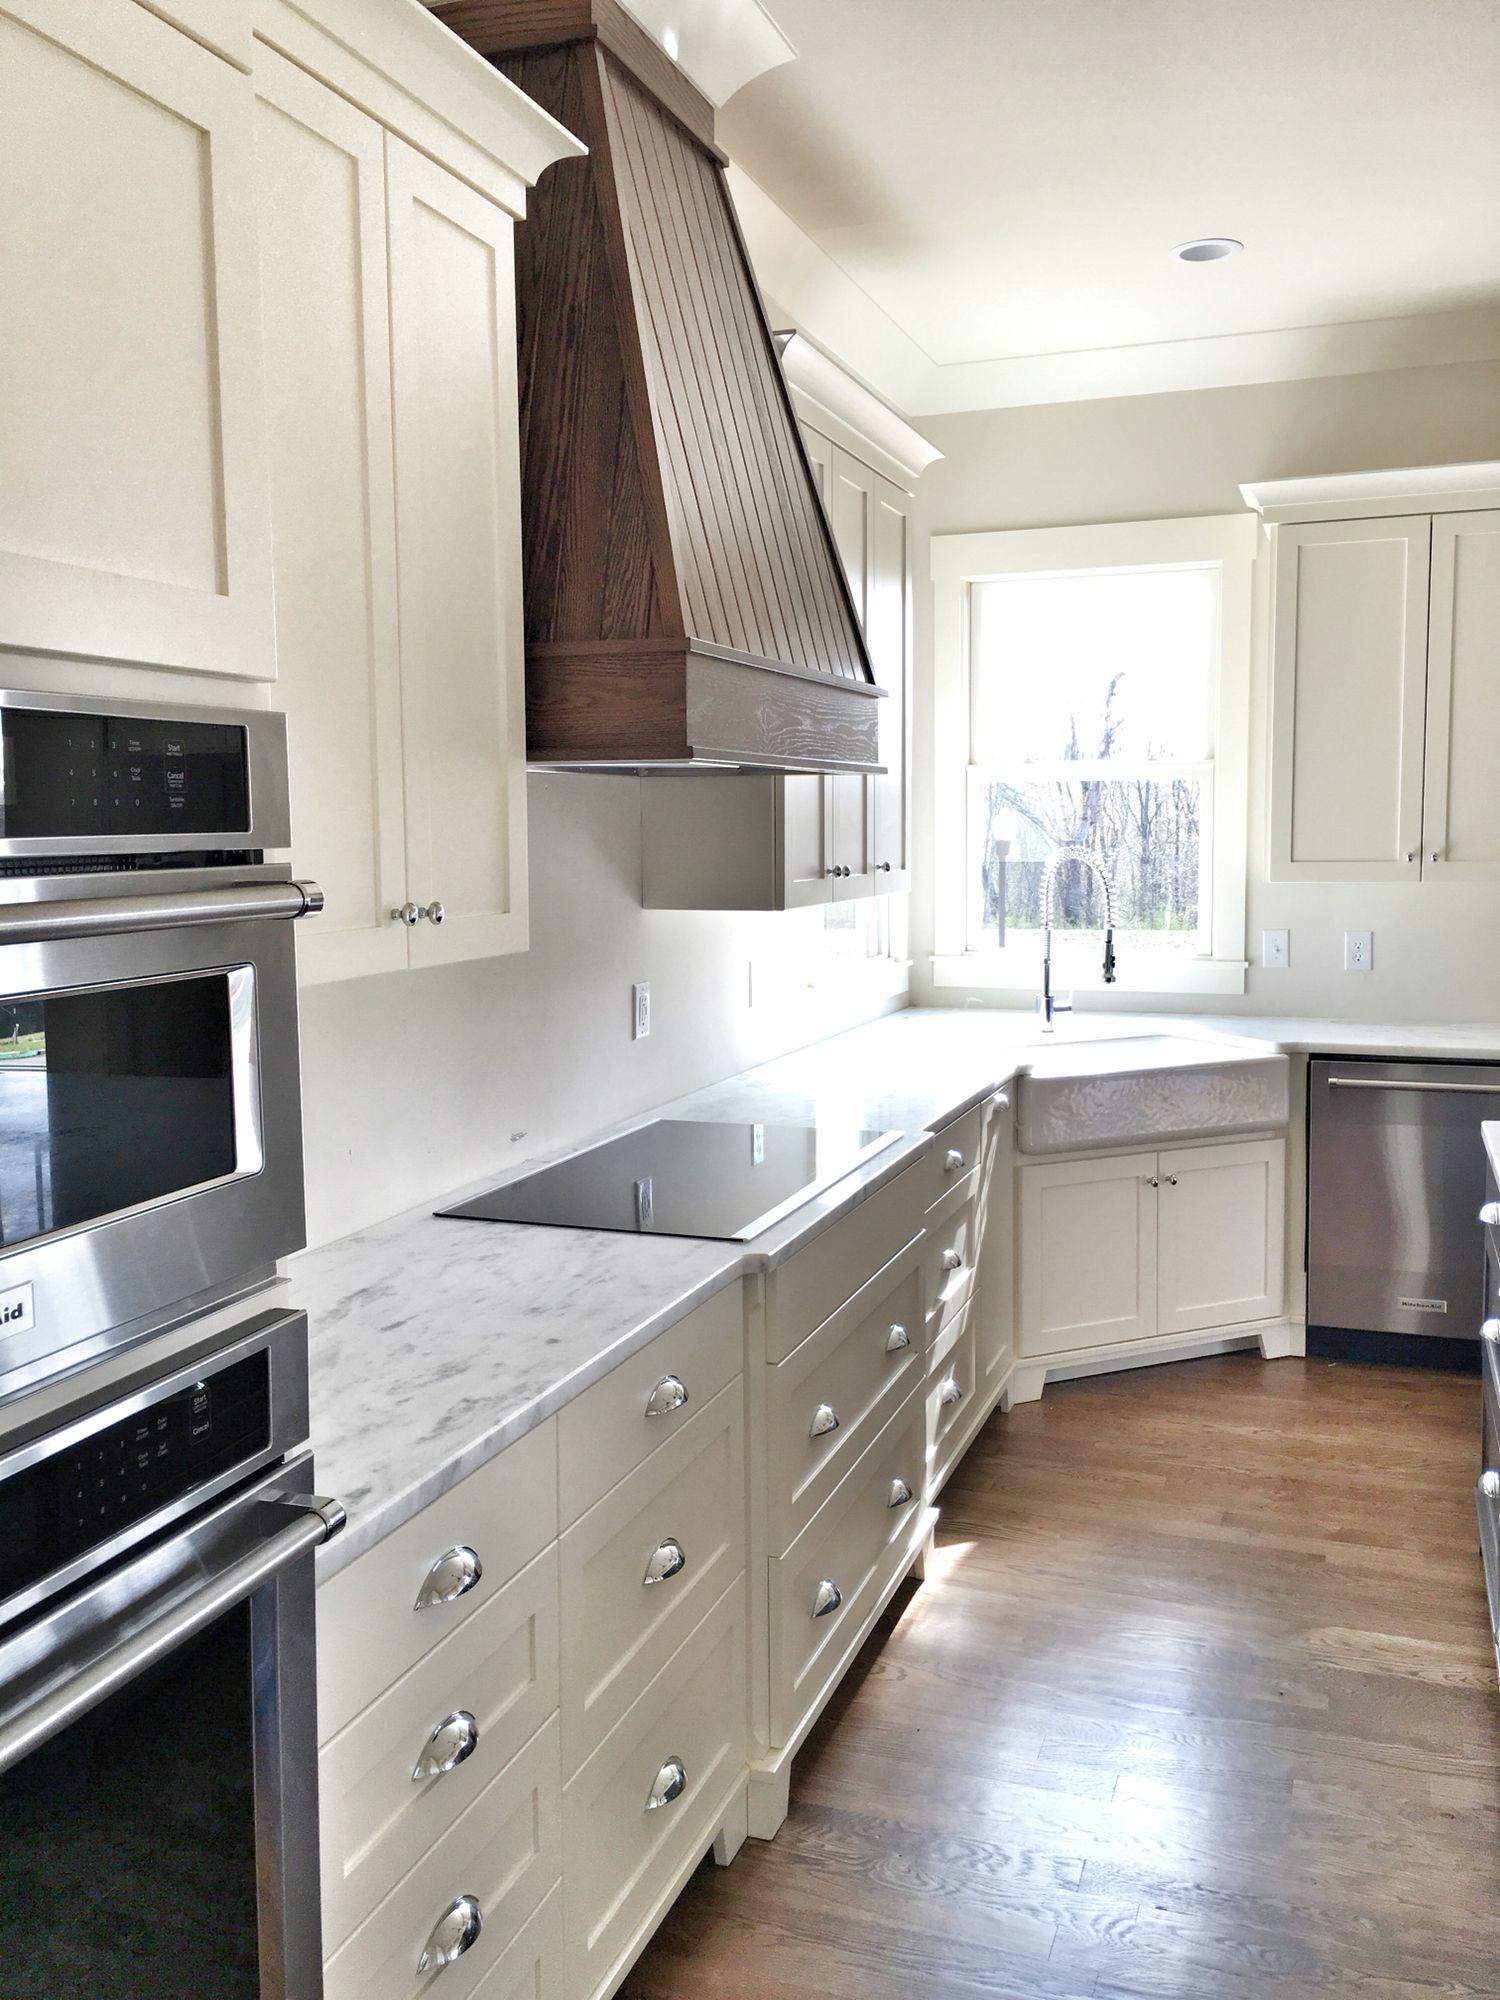 Huntsville Alabama Built By Jimmybryanconstruction Kitchen Custom Homes Kitchen Home